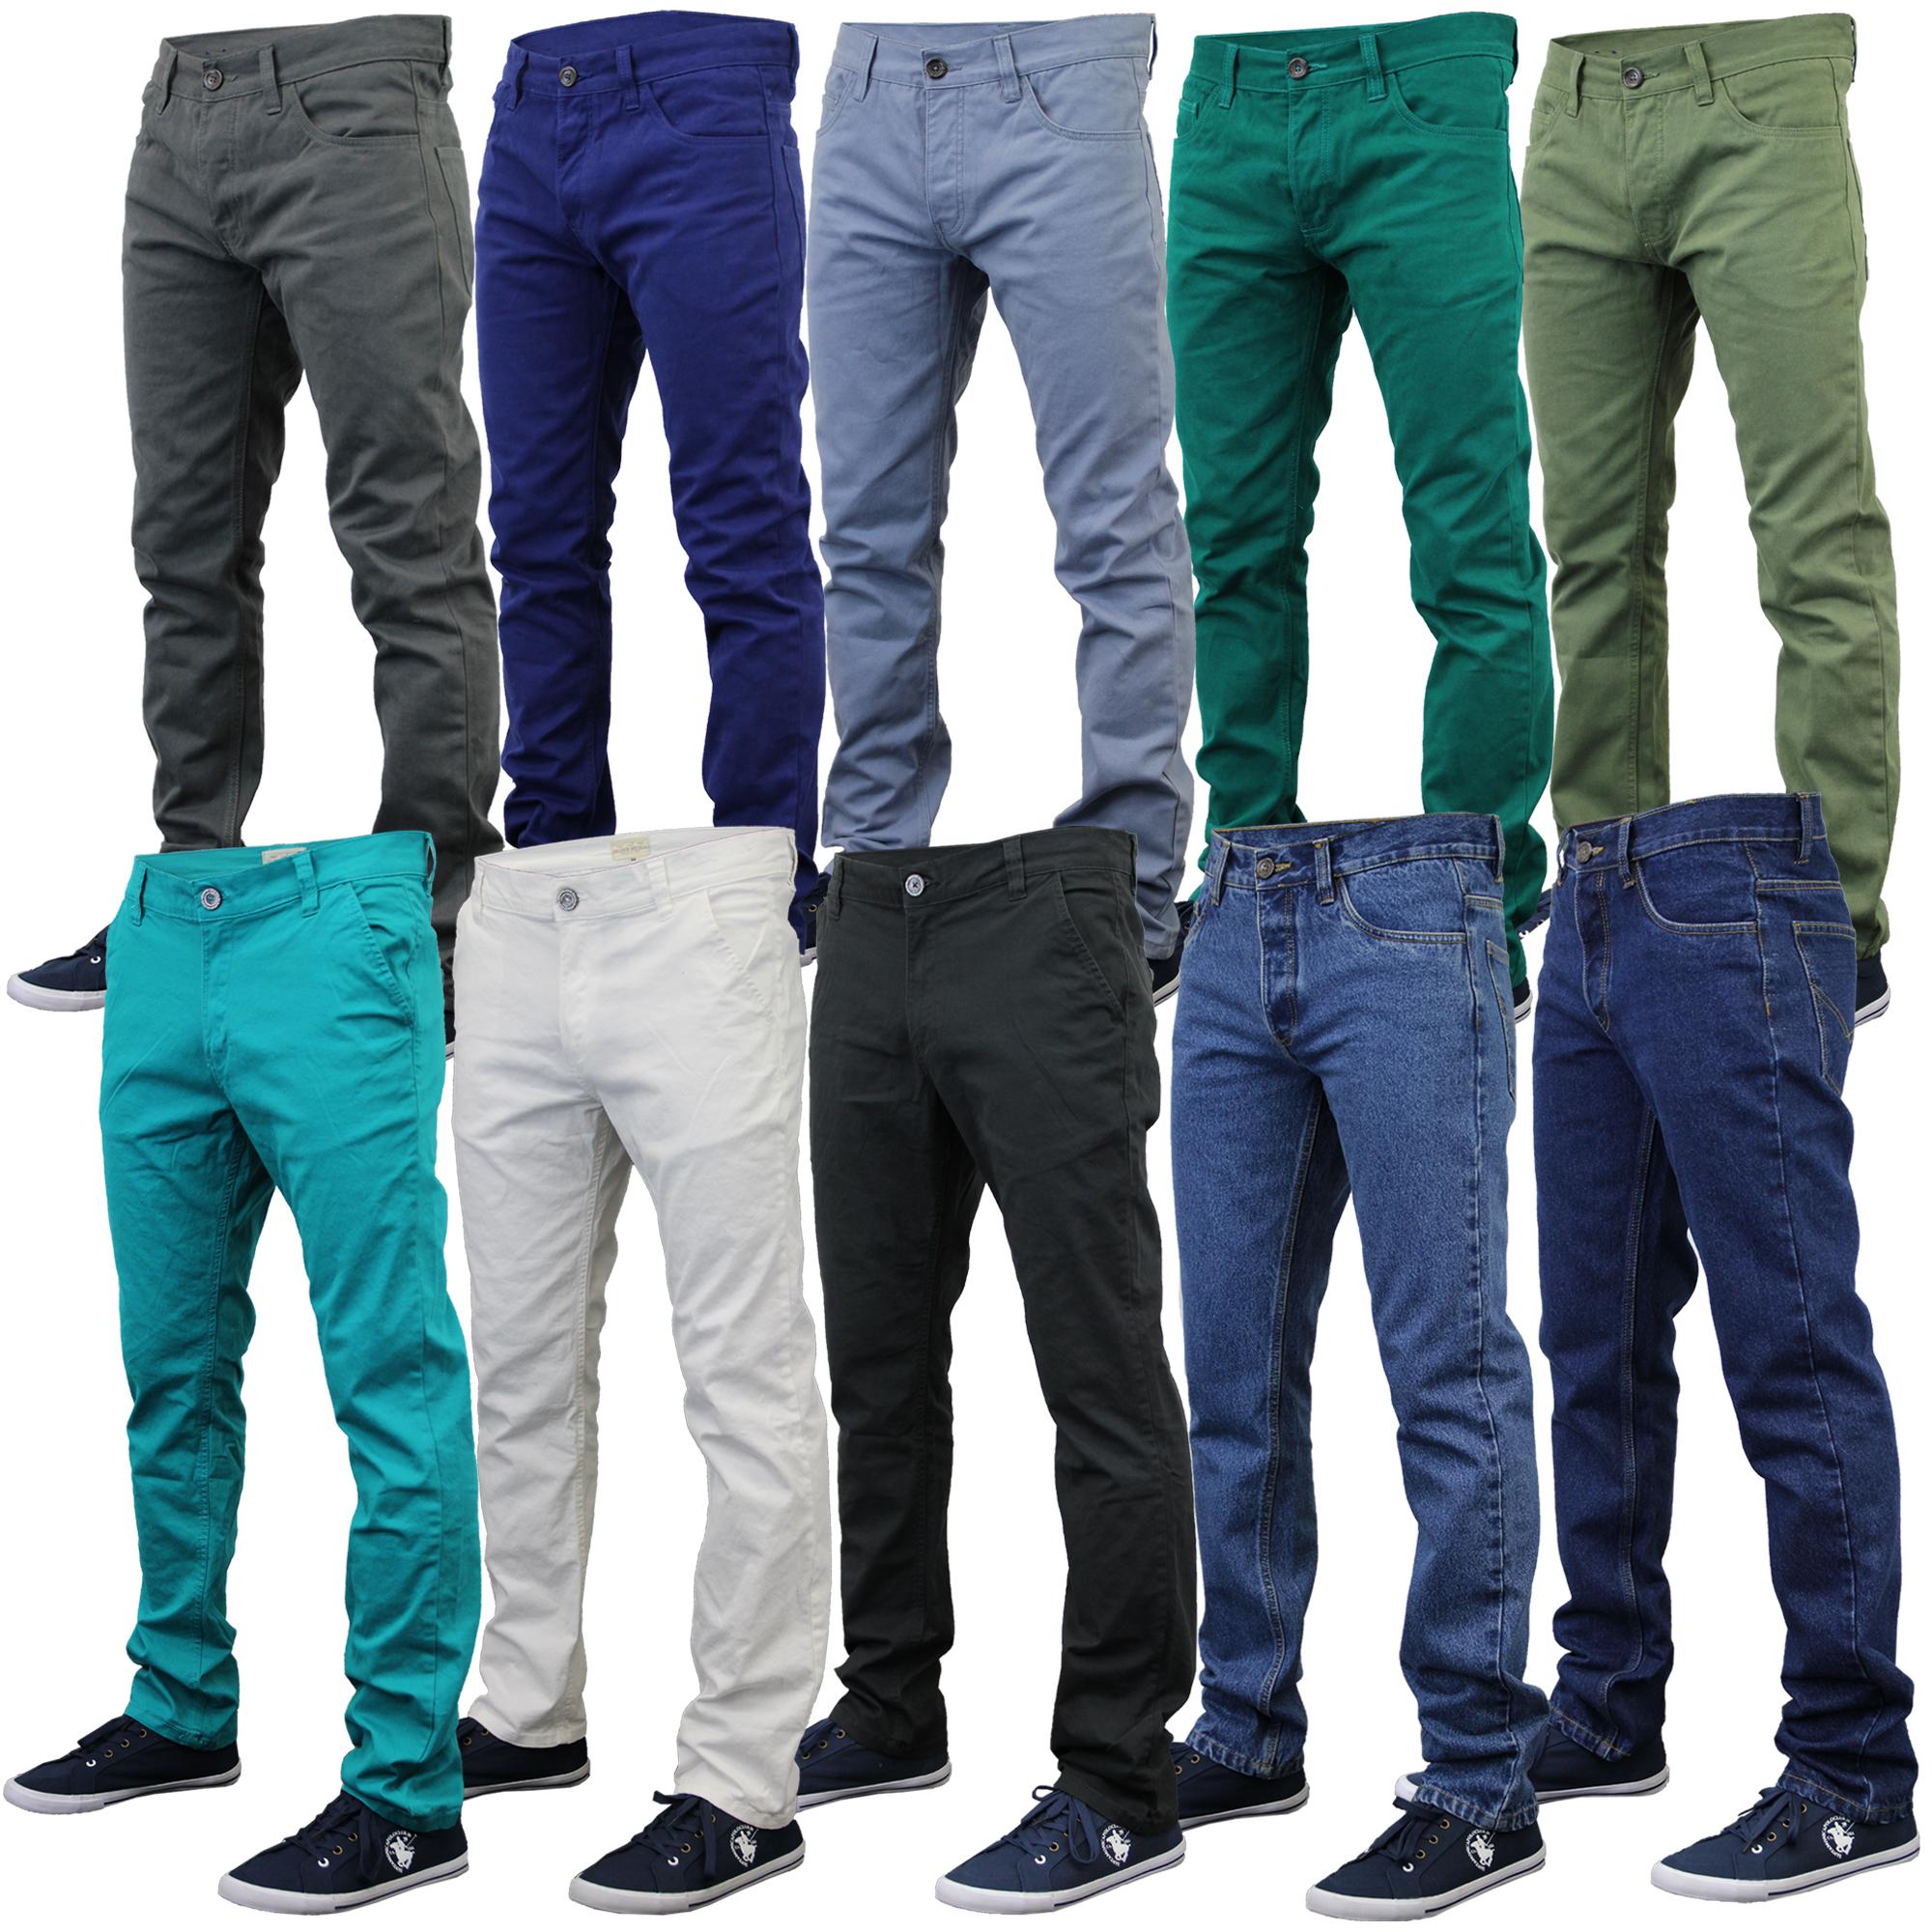 mens chino jeans jack south kushiro city denim pants slim fit casual summer PRXYEGS